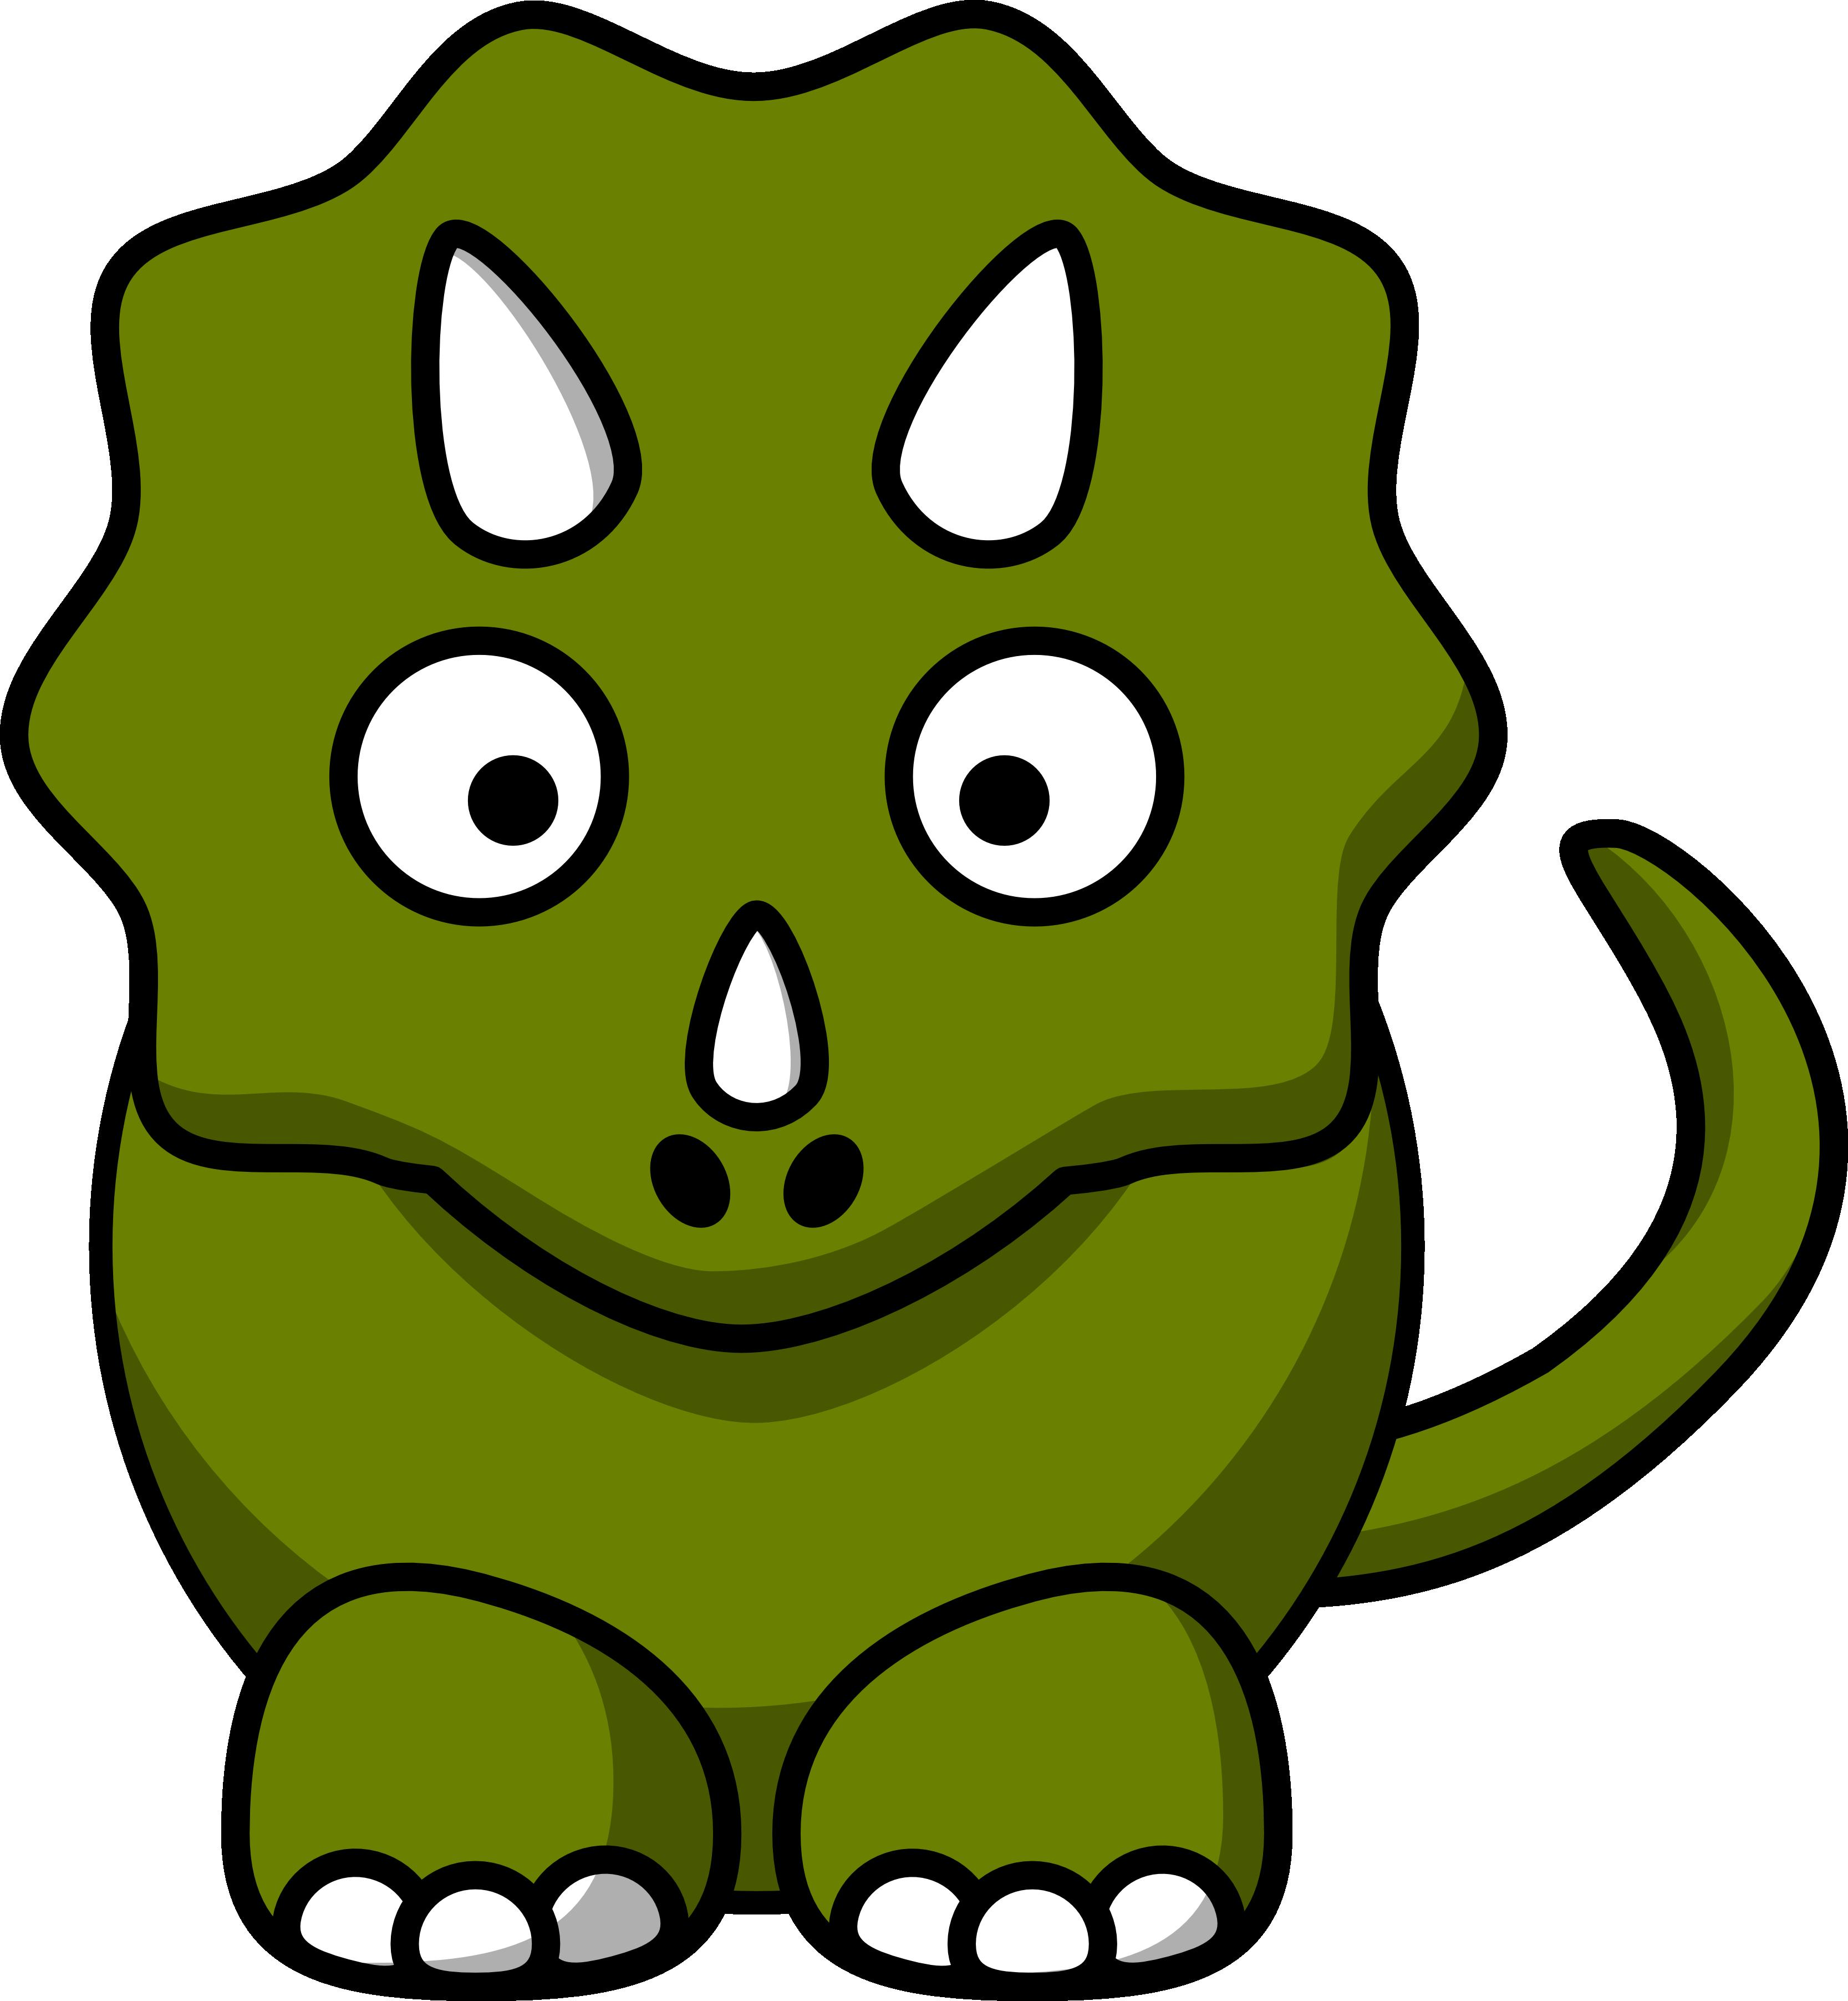 Similiar Printable Dinosaur Cartoon Pictures Keywords